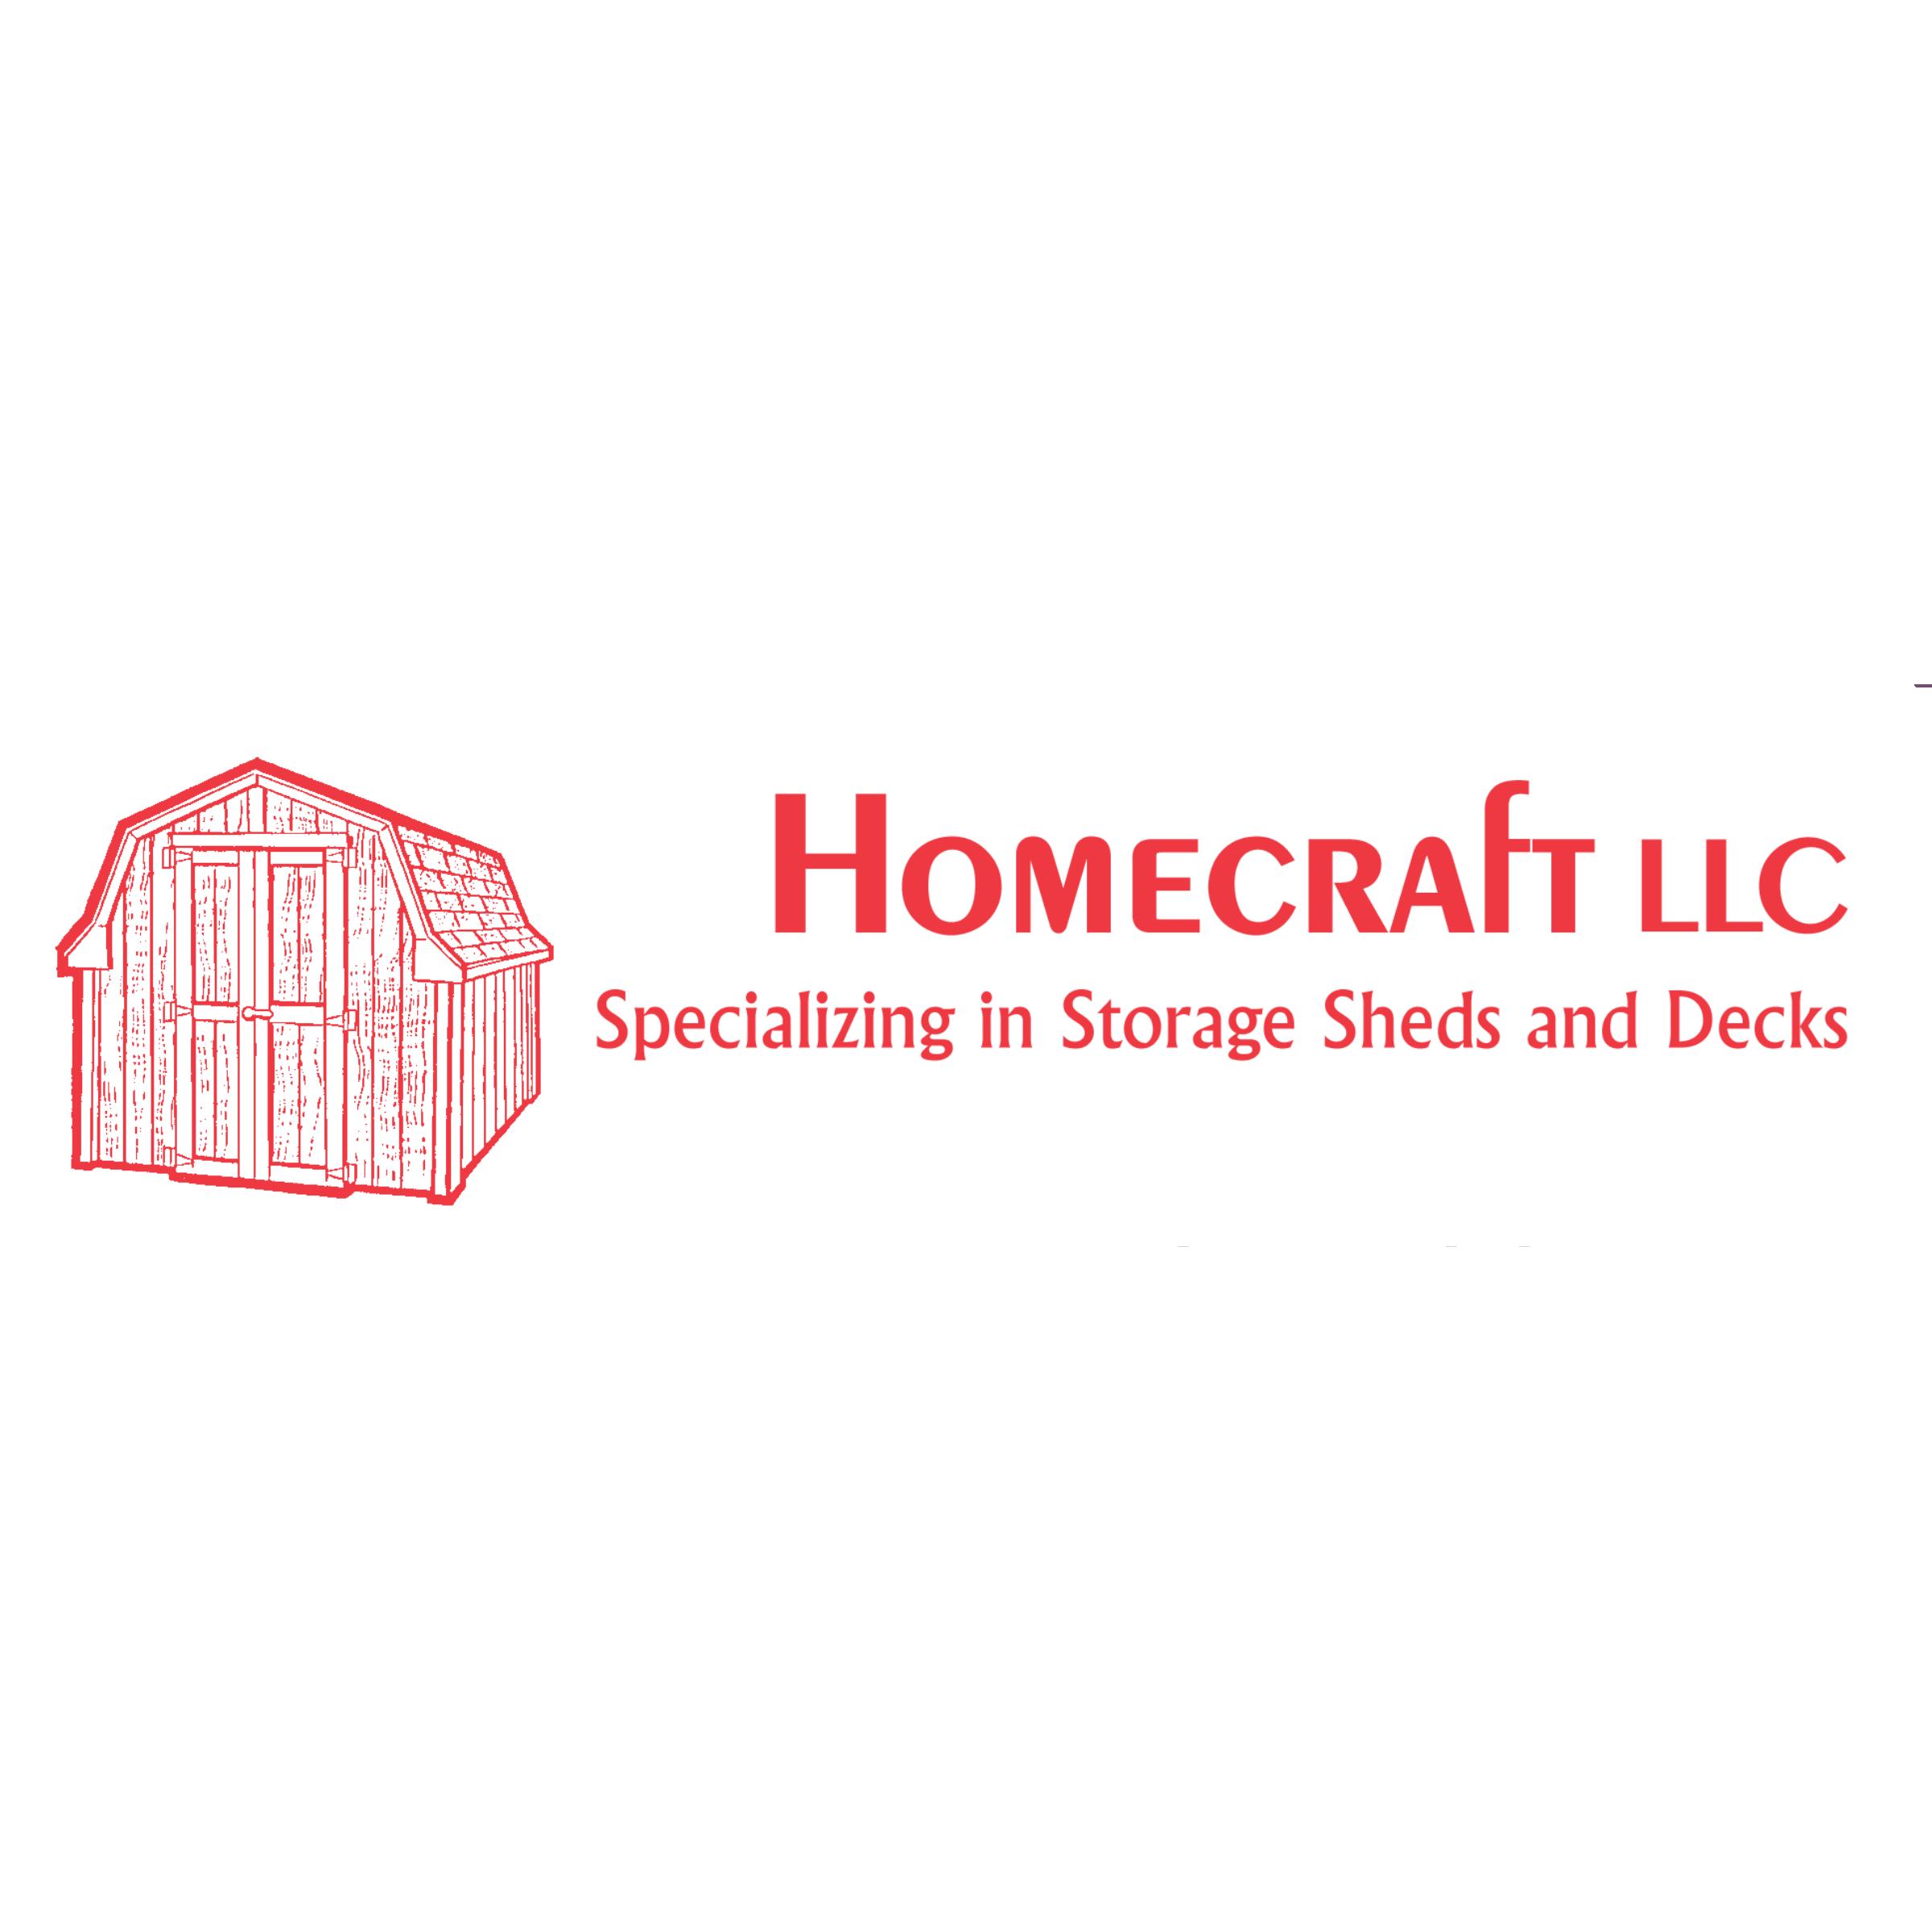 Homecraft LLC